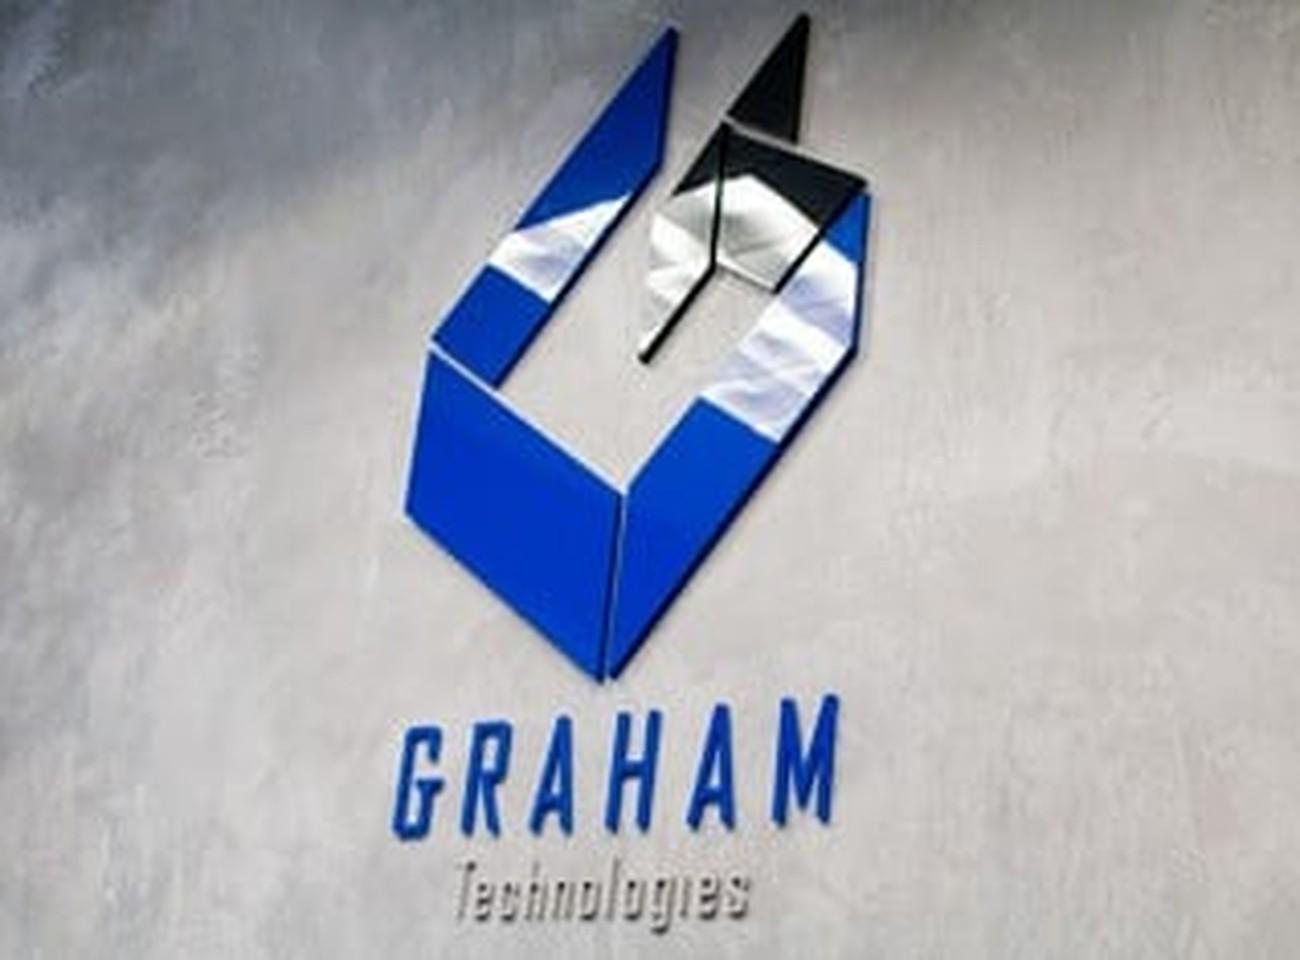 Graham Technologies Careers